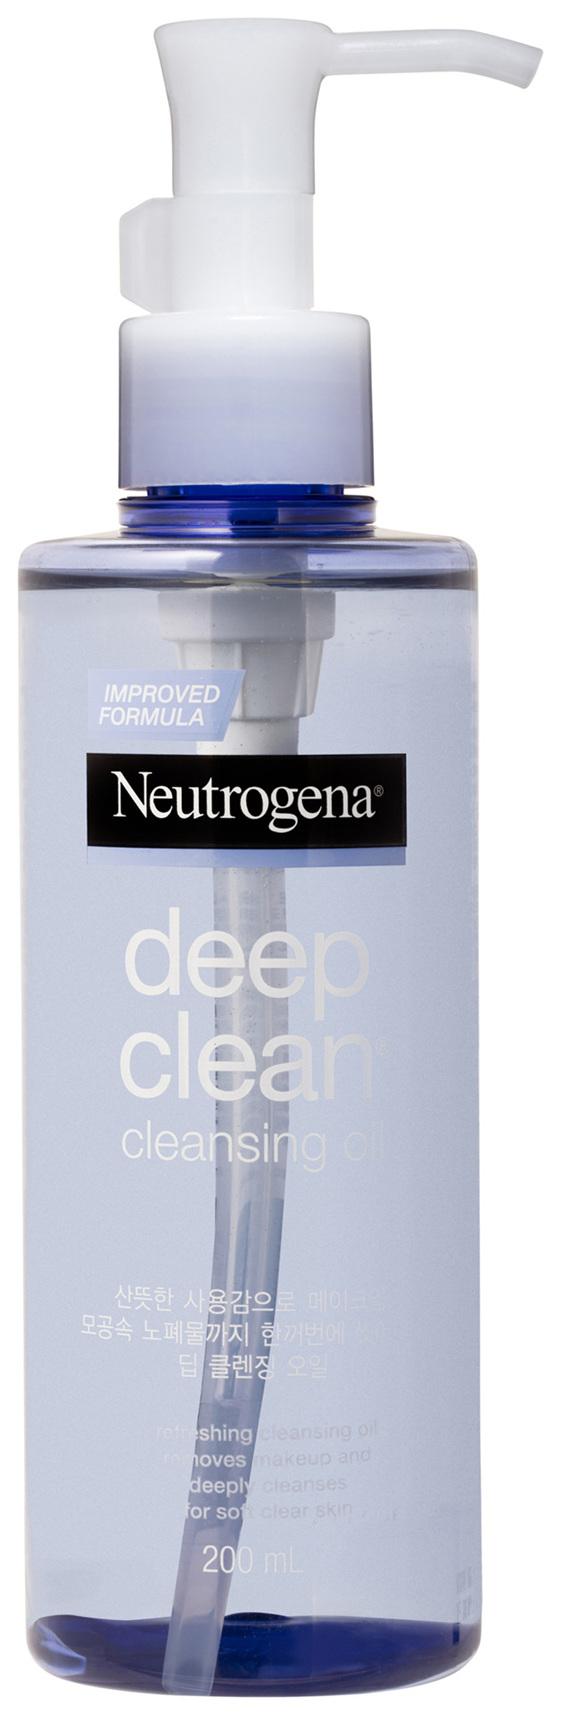 Neutrogena Deep Clean Cleansing Oil 200mL